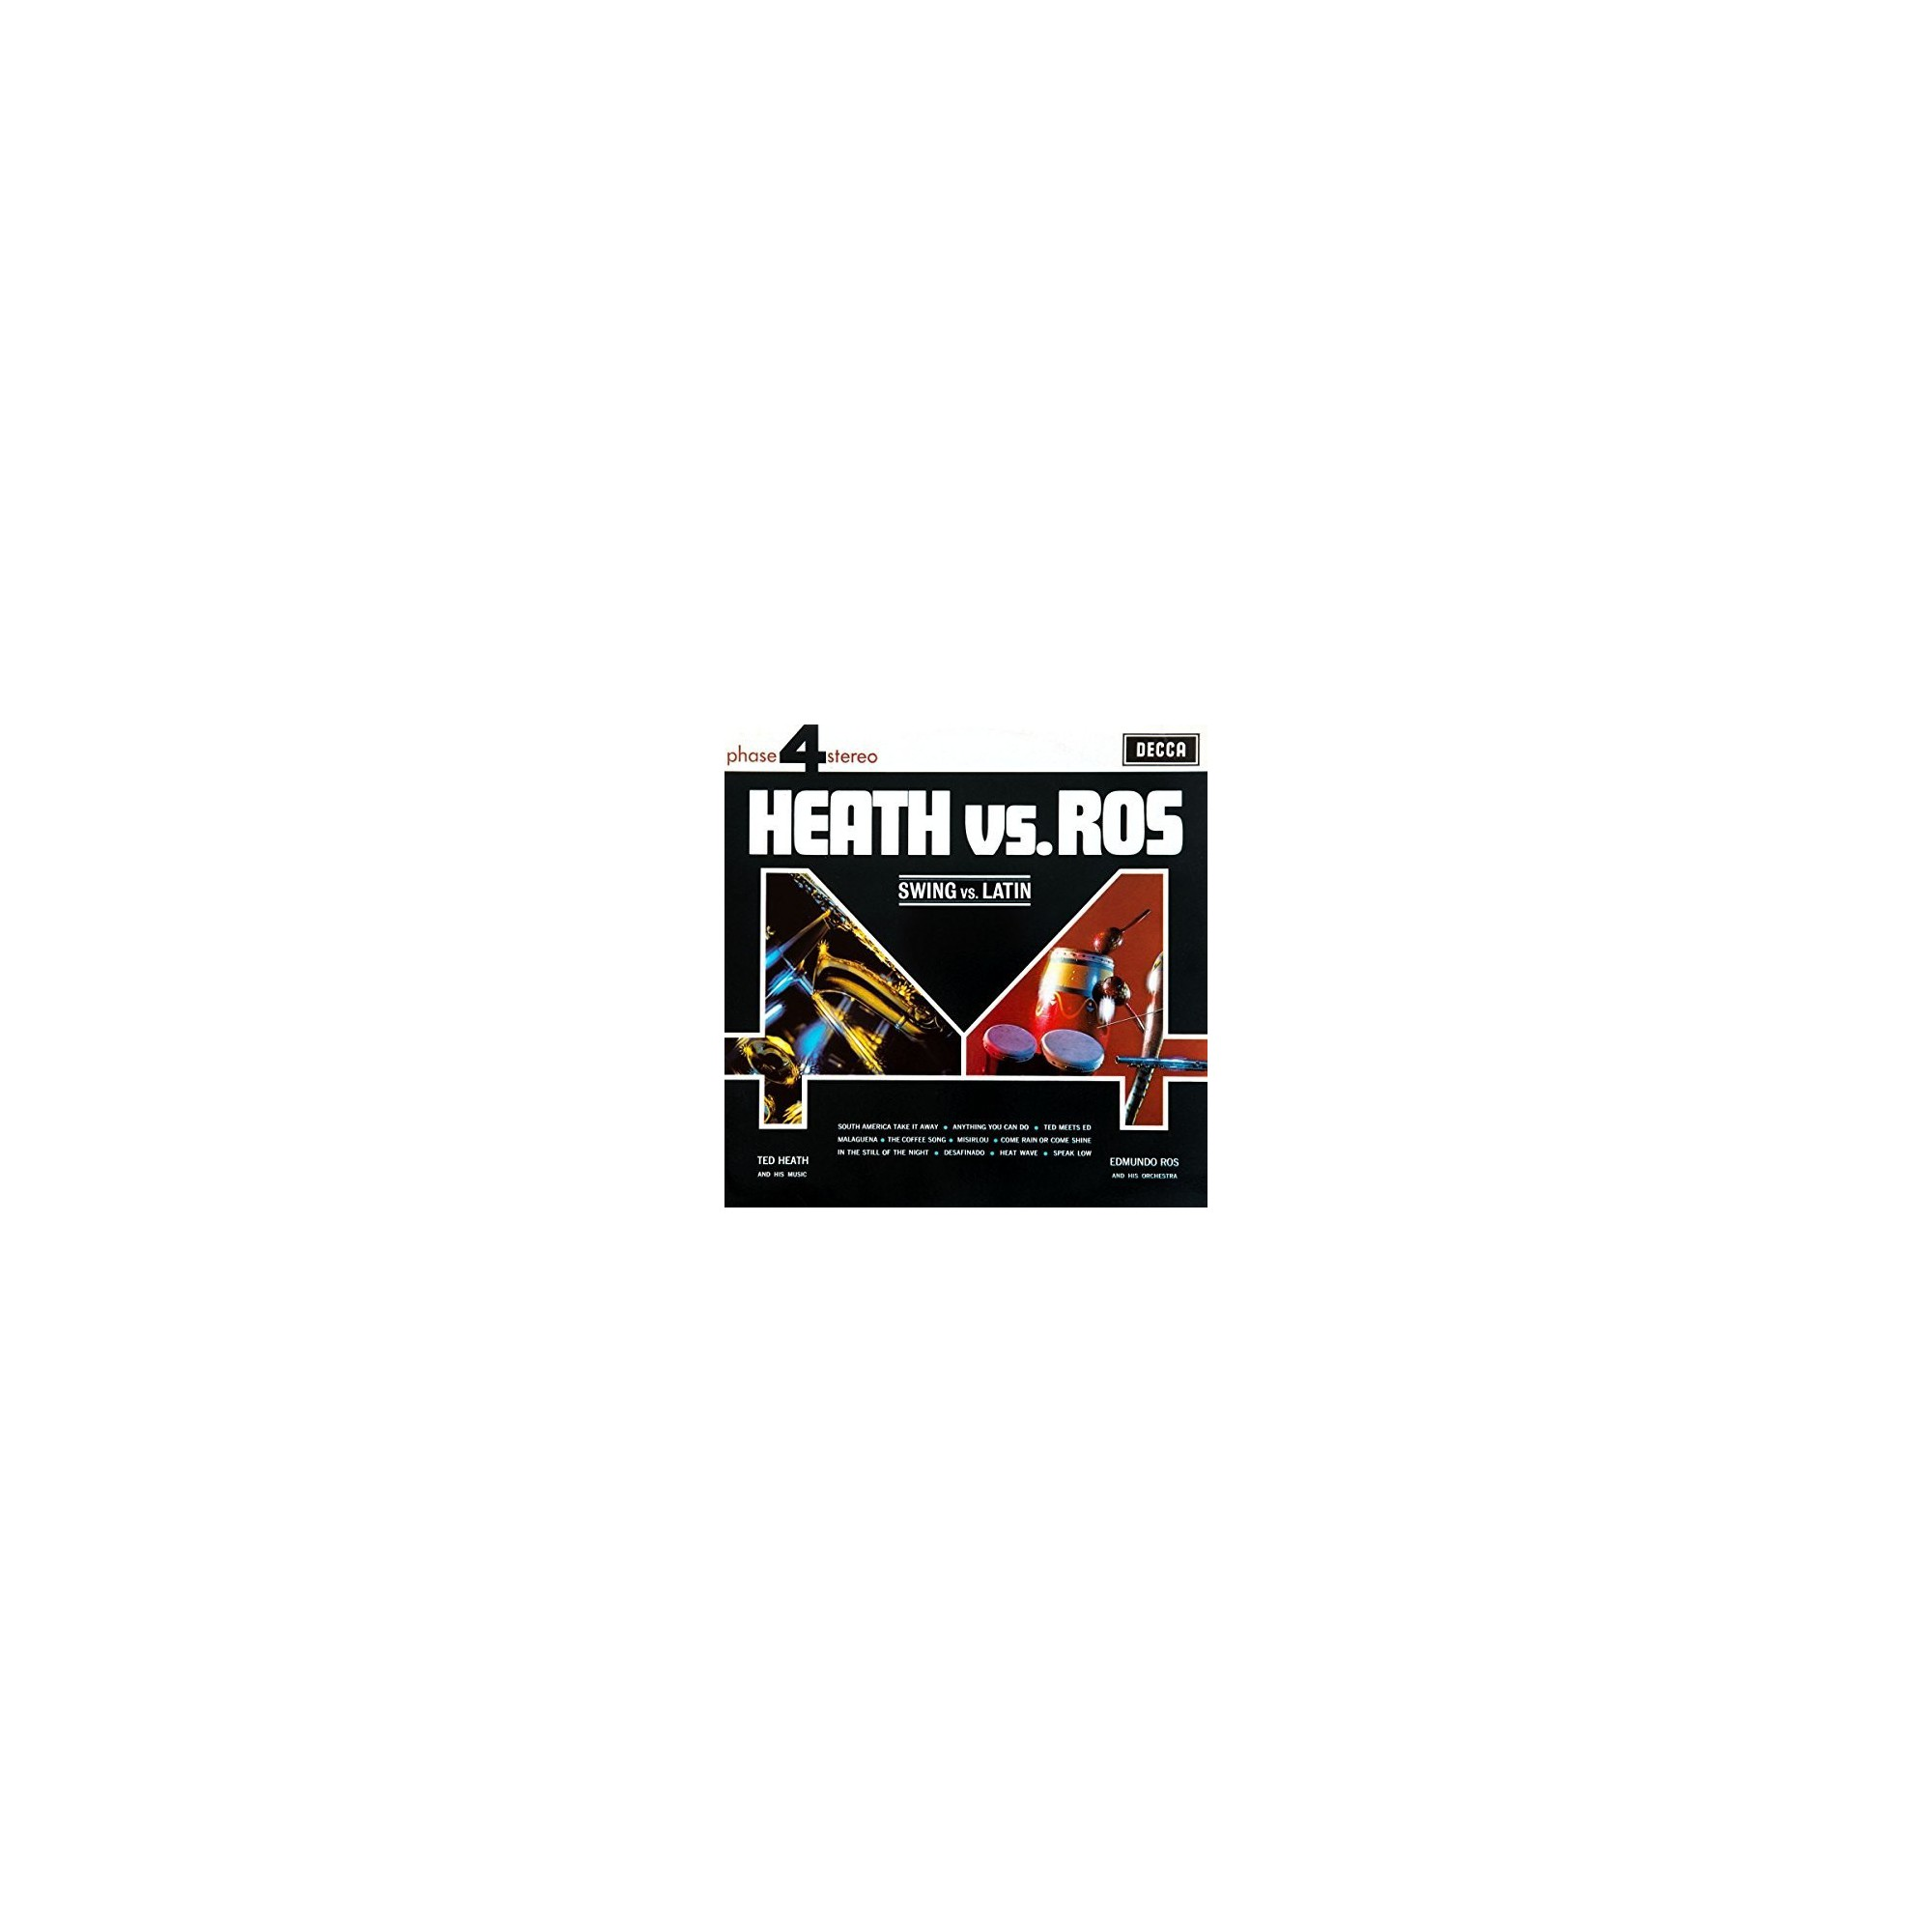 Puja zimmer fliesen modelle various  heath versus ros vols  u  vinyl  products  pinterest